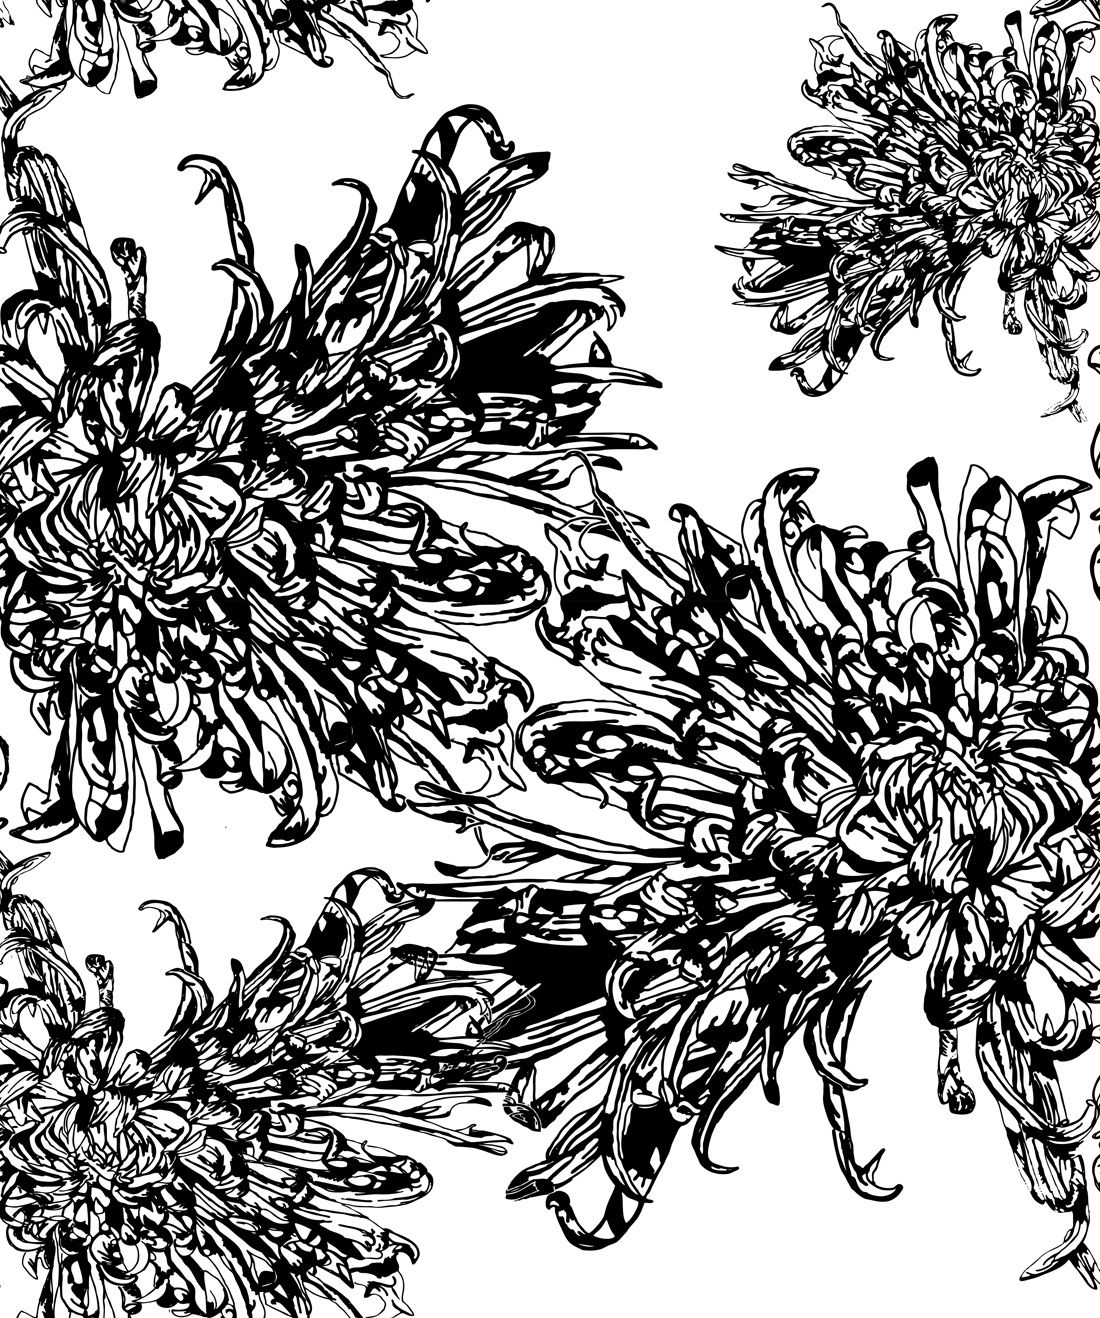 Narnie Wallpaper